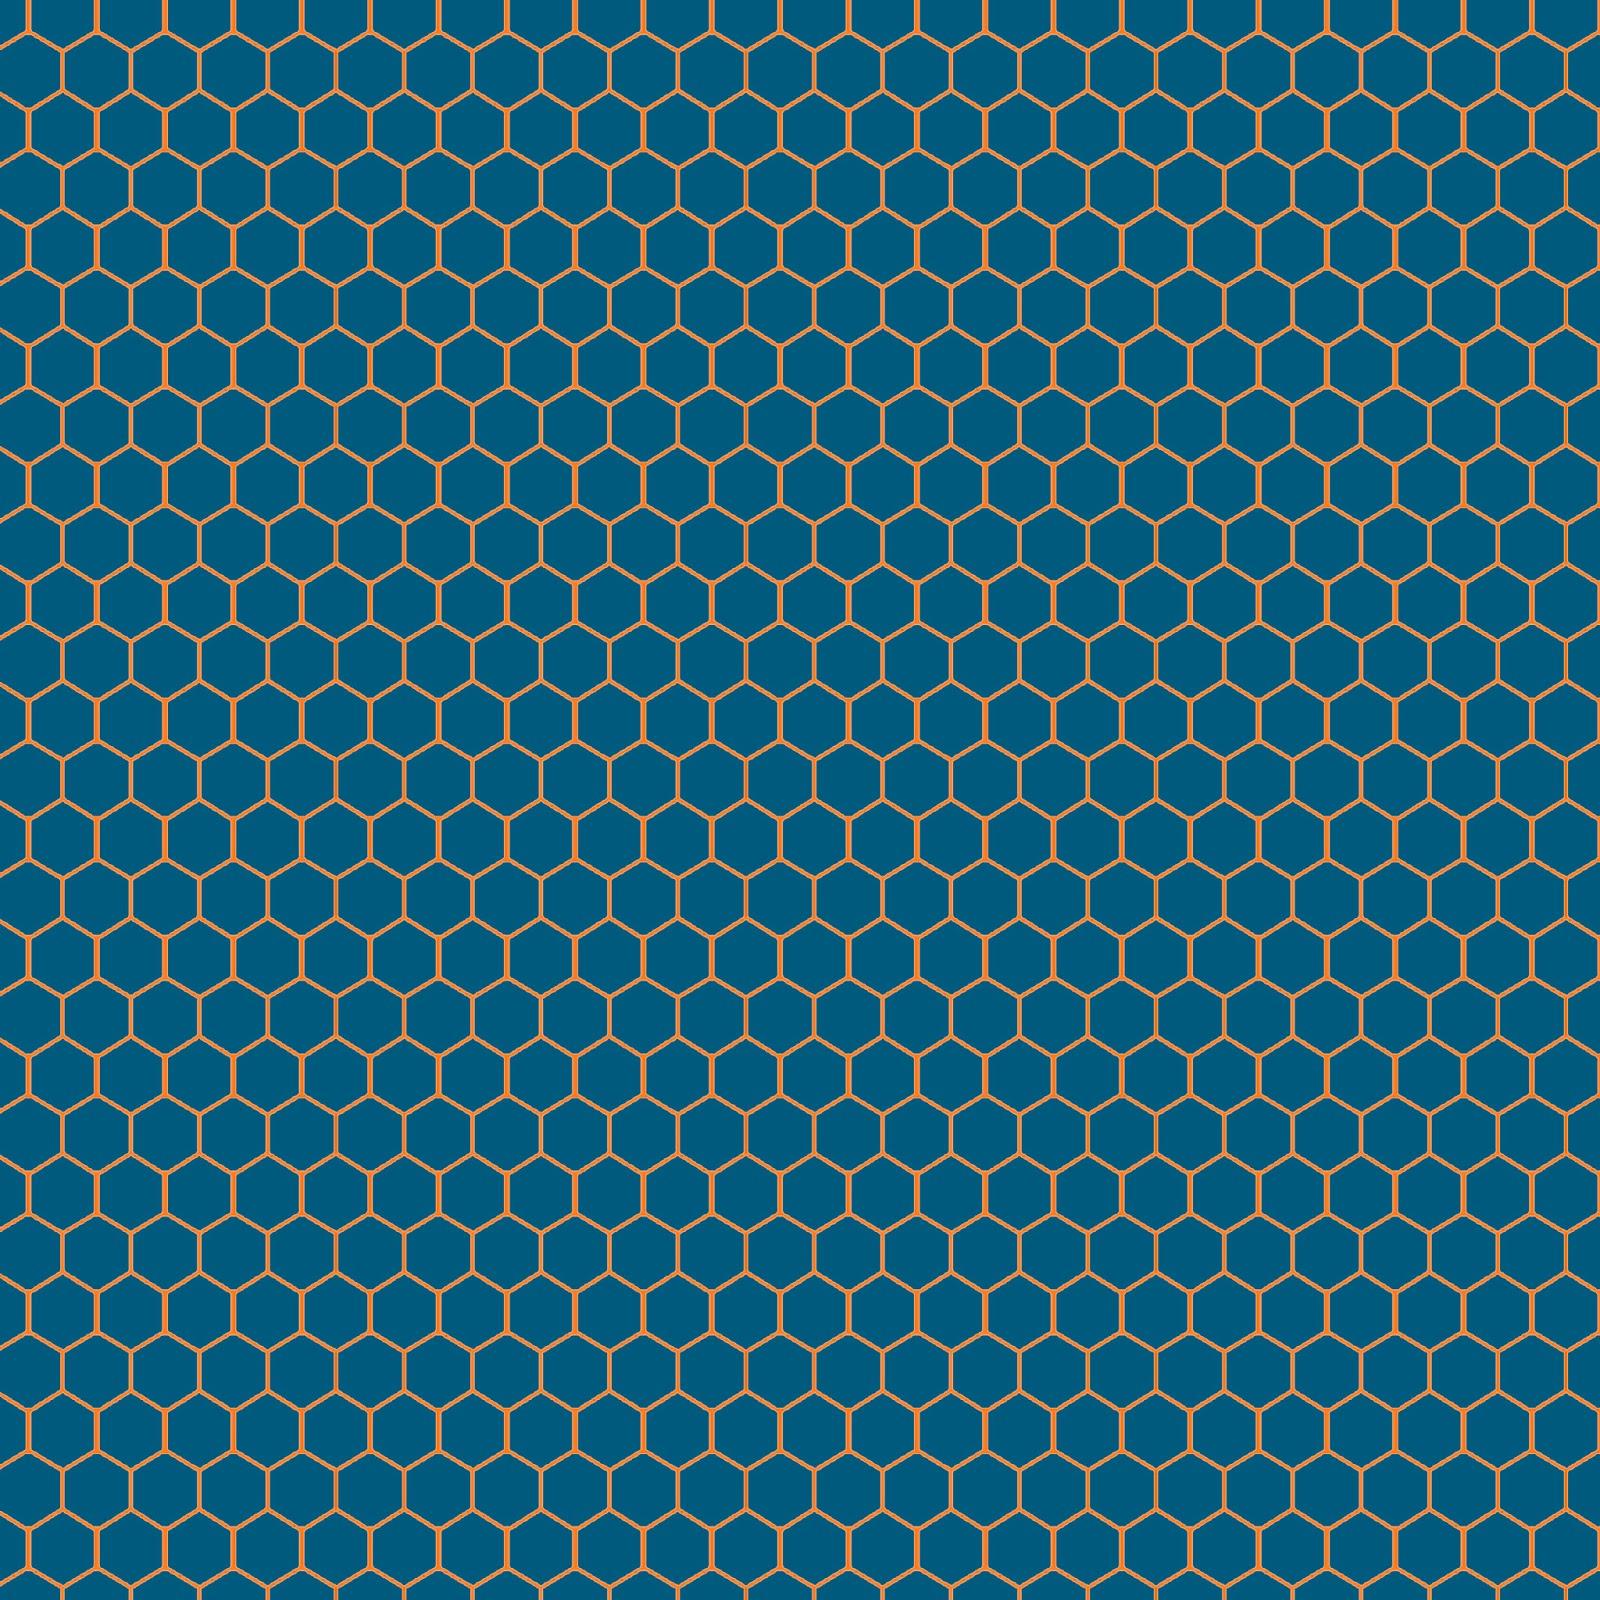 50 Honeycomb Wallpaper On Wallpapersafari